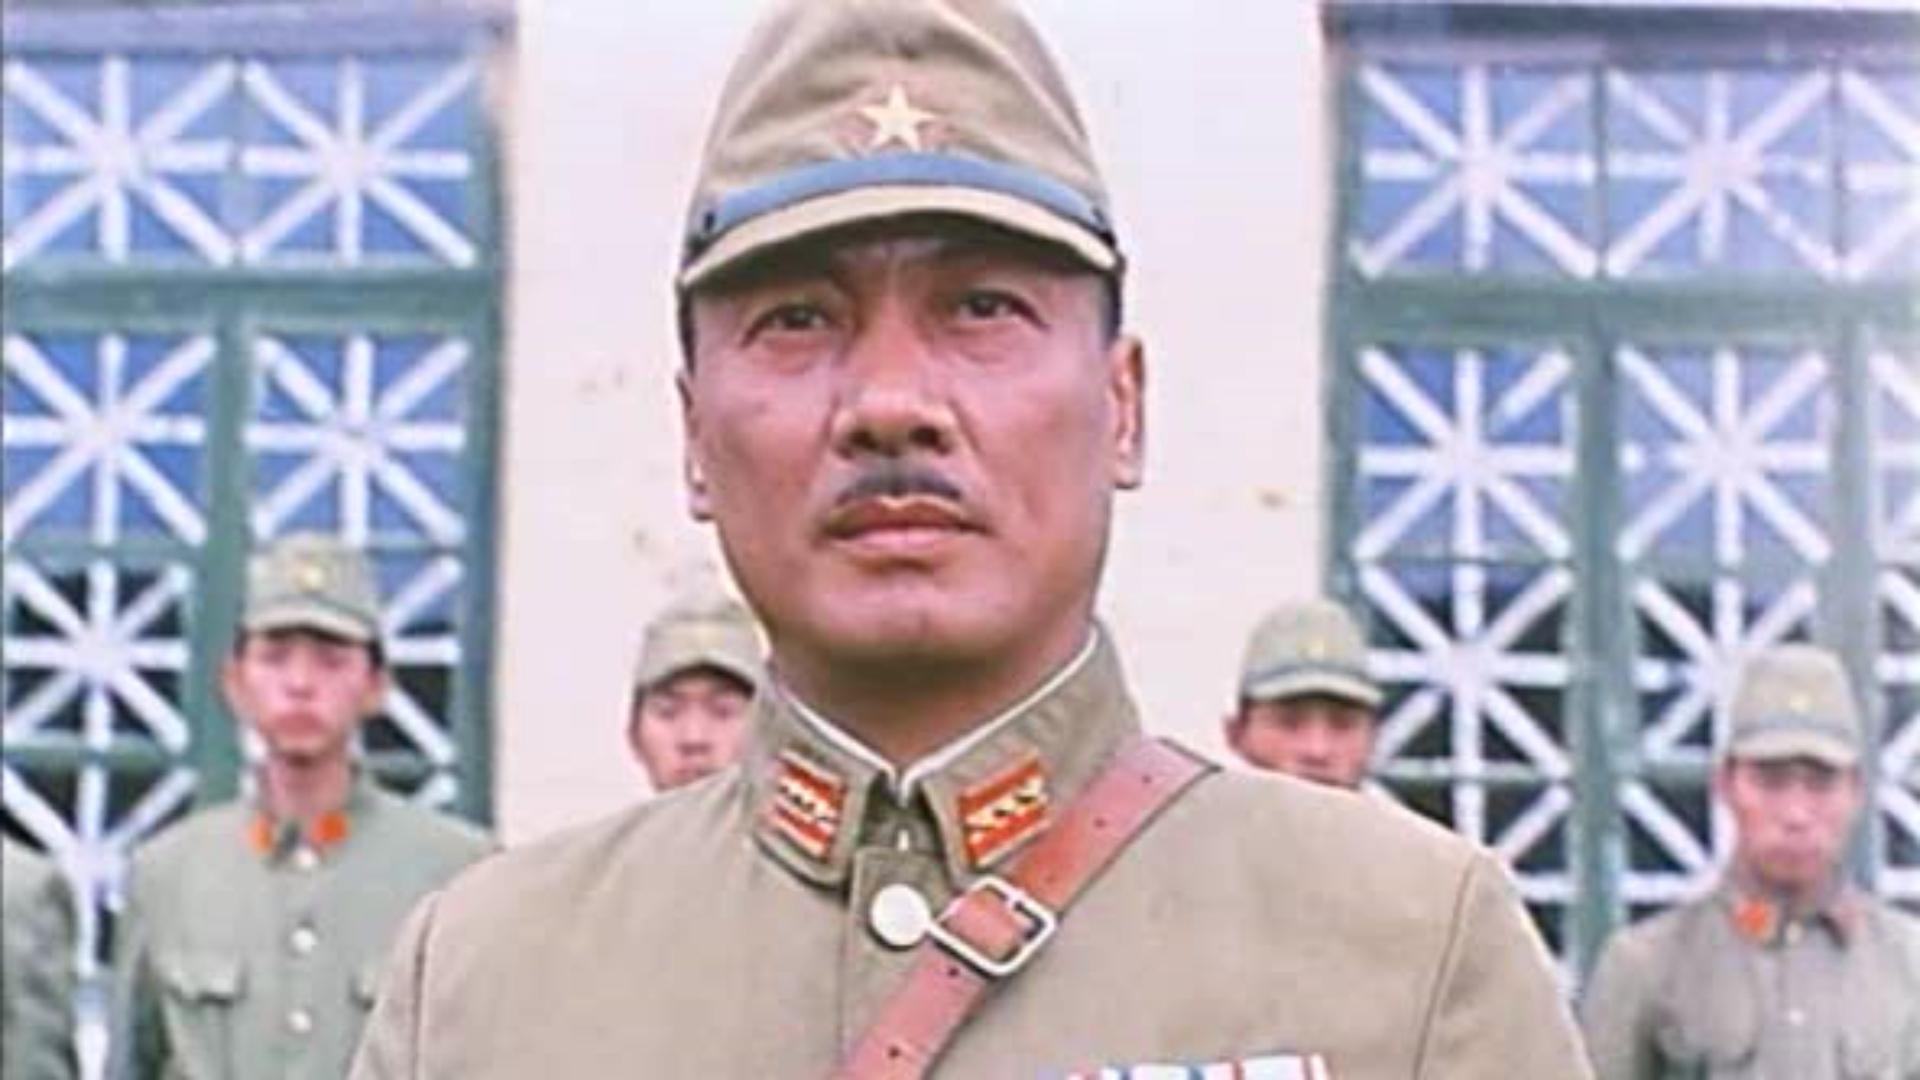 Man Behind The Sun 3 – A Narrow Escape /Maruta 3 - Destroy All Evidence / Hei Tai Yang 731 Si Wang Lie Che (1994)